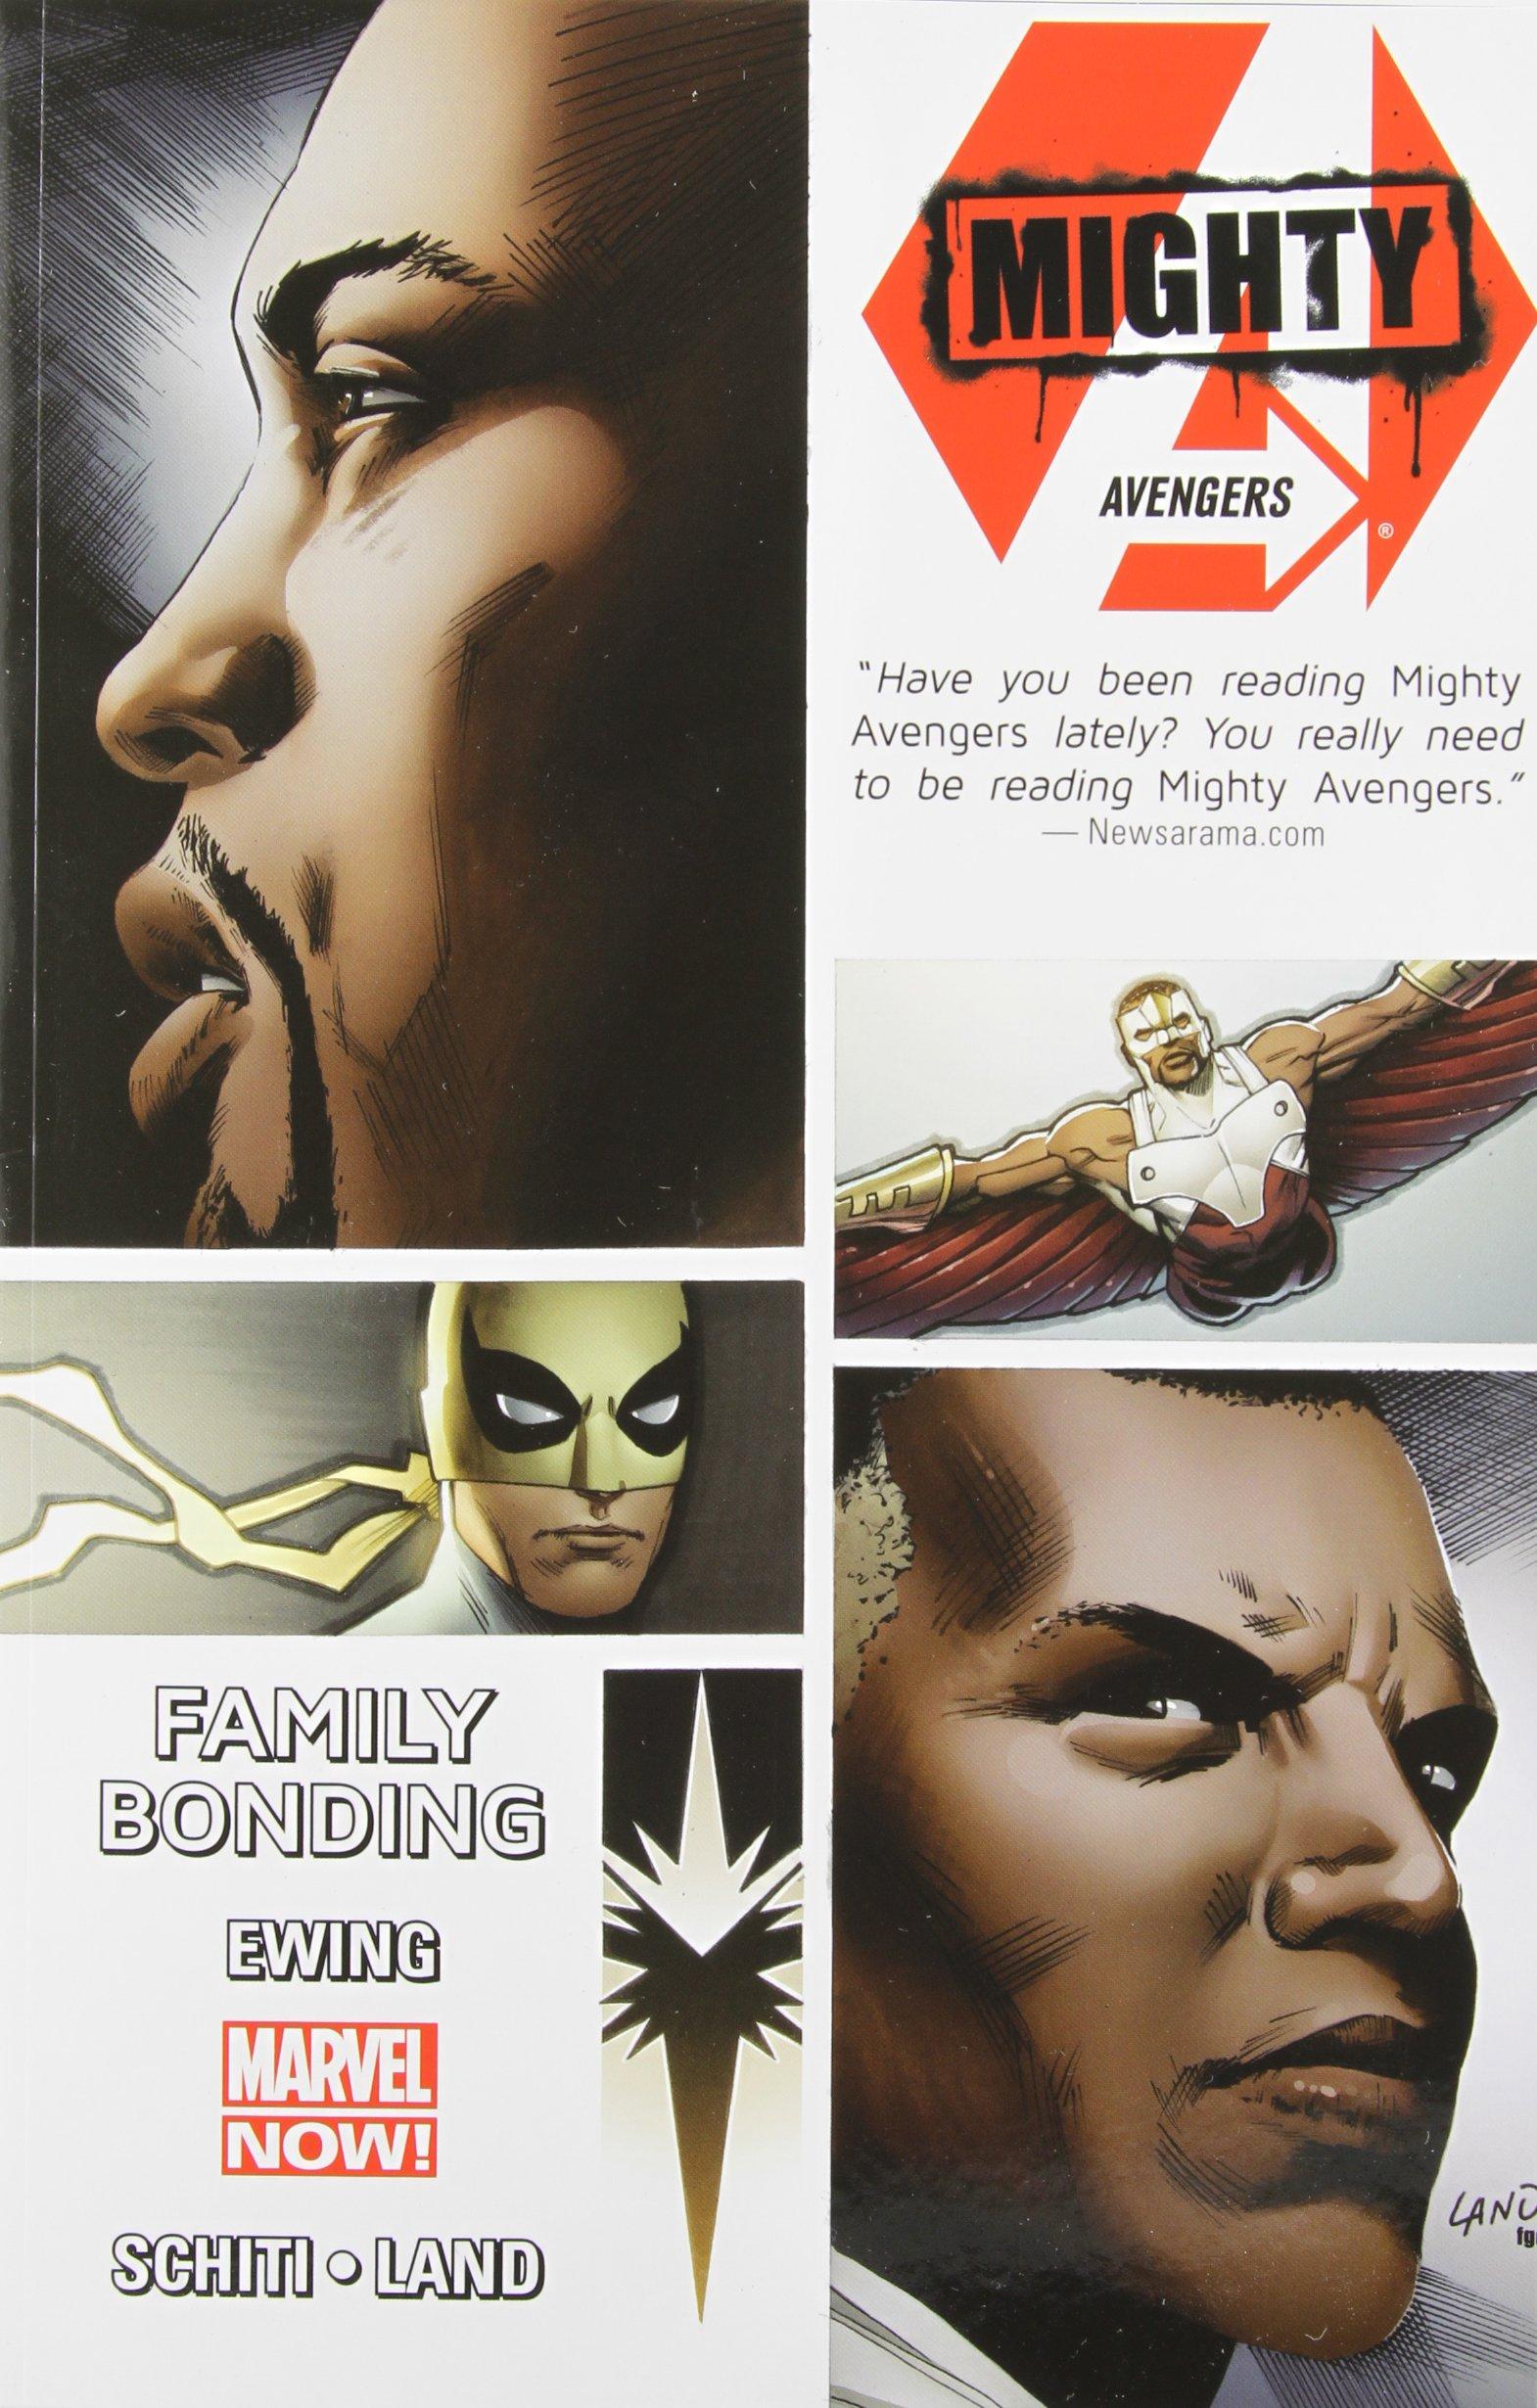 Amazon: Mighty Avengers Volume 2: Family Bonding (marvel Now)  (9780785188759): Al Ewing, Greg Land, Valerio Schiti: Books